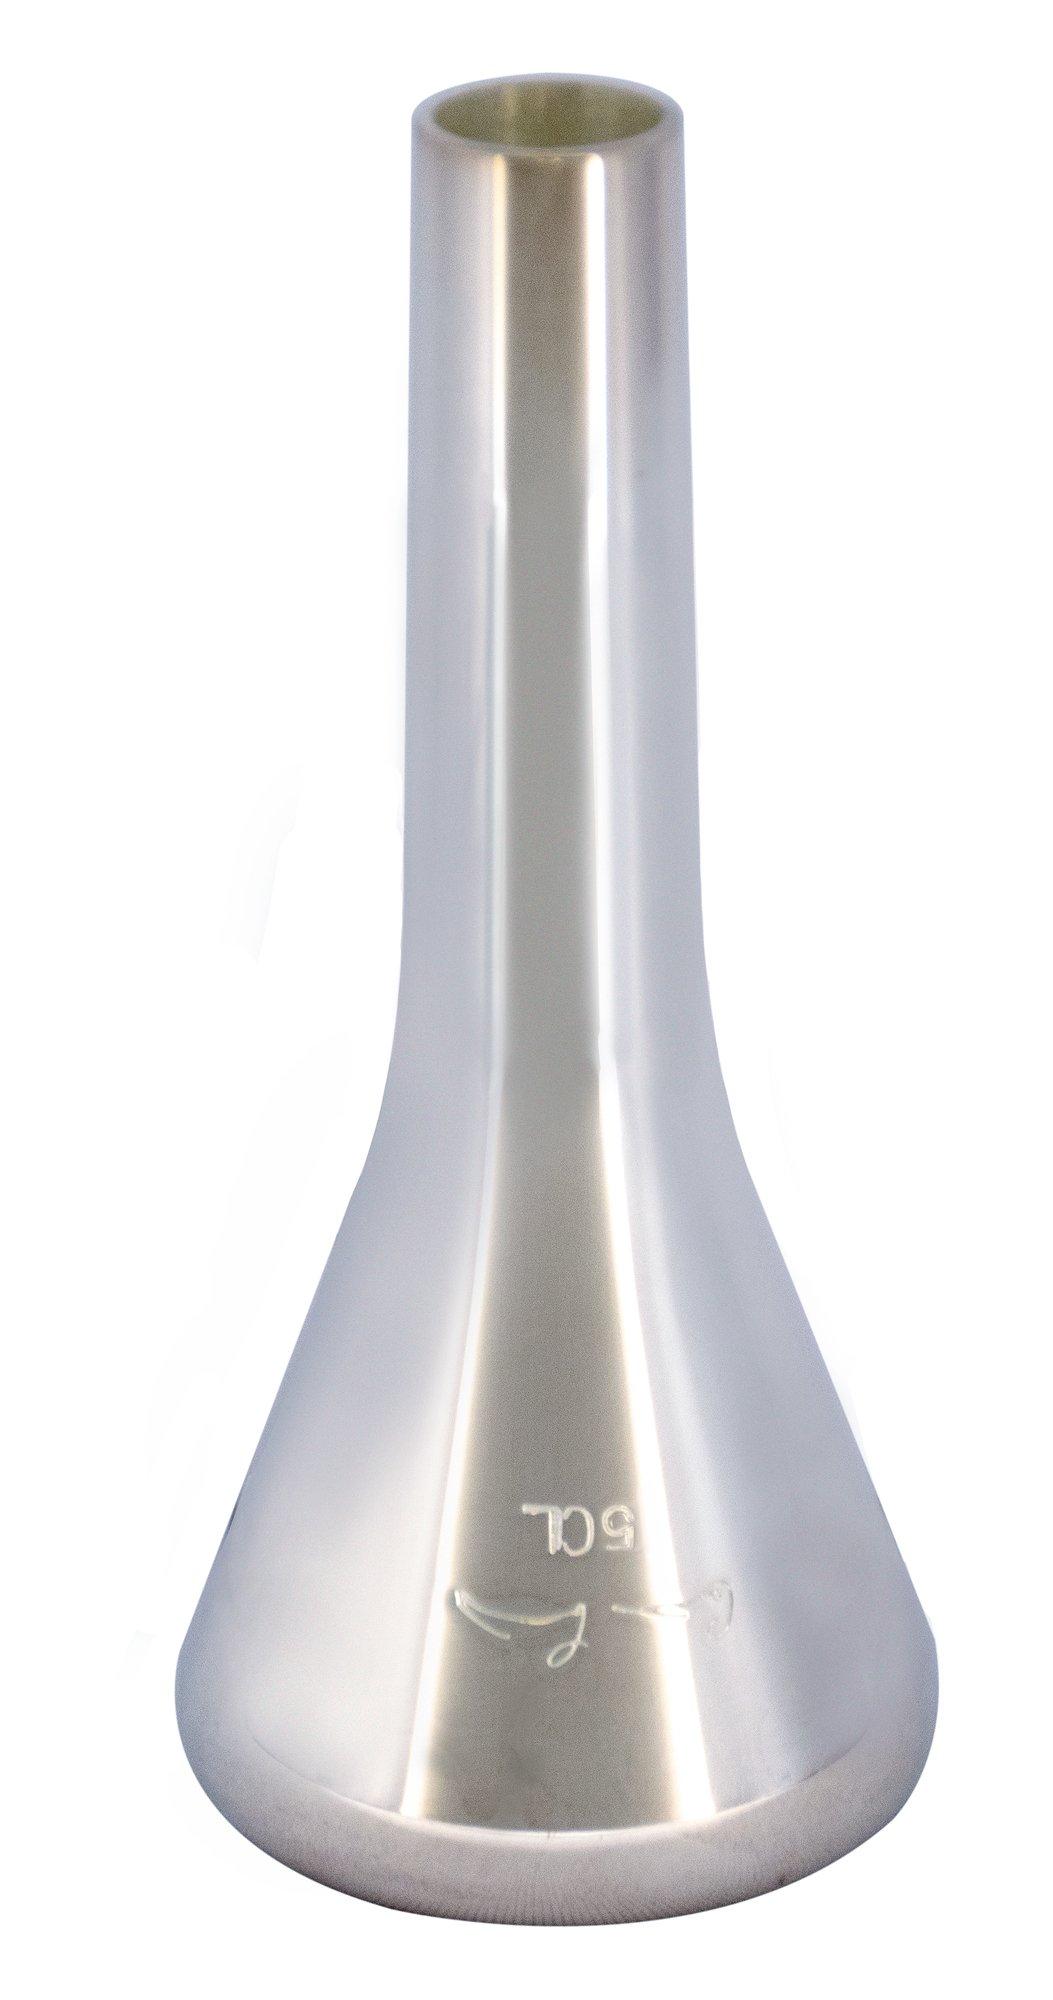 UMI Christian Lindberg Series Trombone Mouthpiece 5Cl Silver